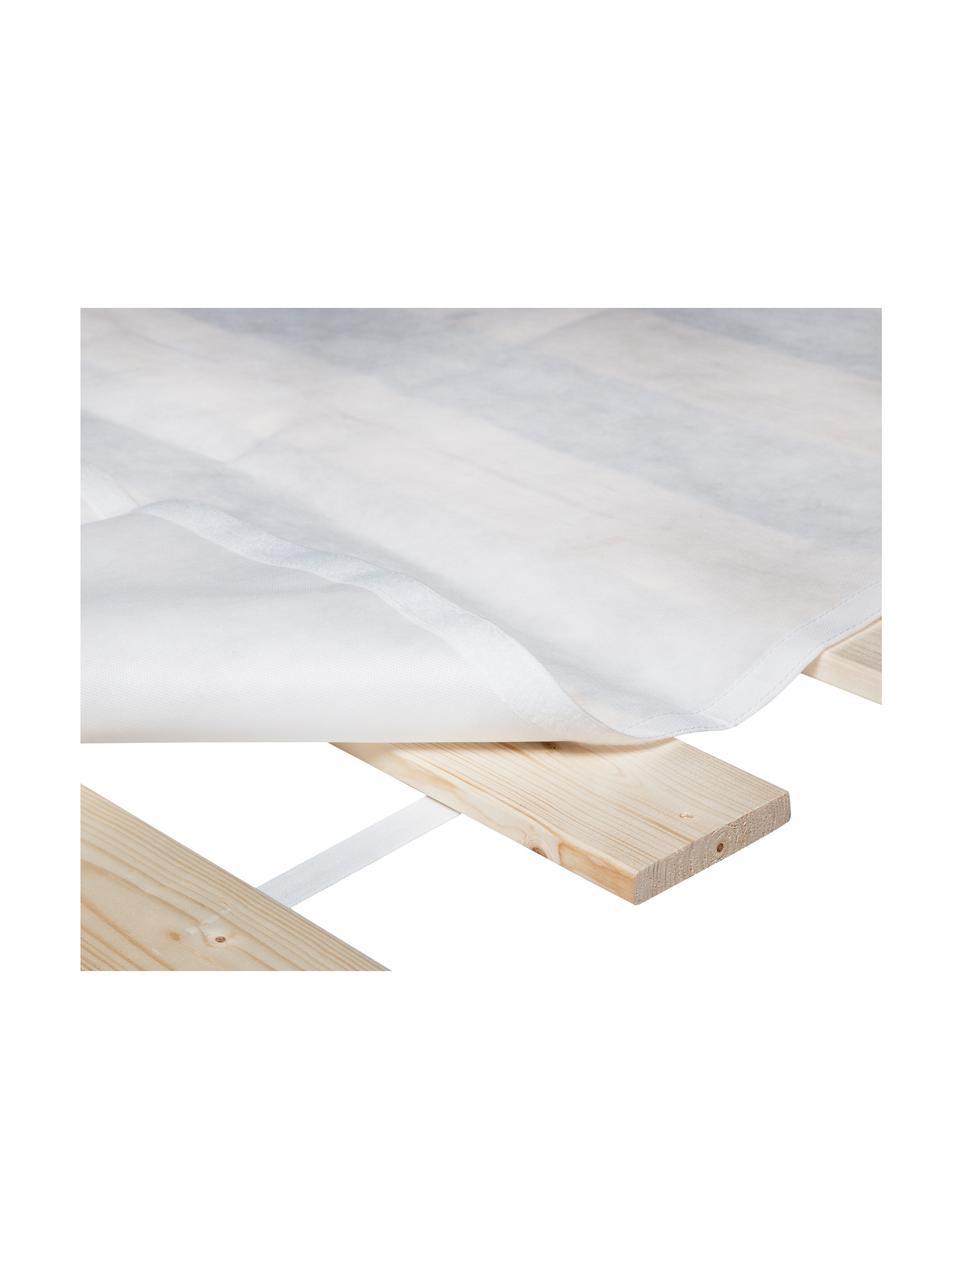 Lattenbodem Juan Carlos, 2-delig, Lijstwerk: licht houtkleurig. Deksel: wit, 180 x 200 cm